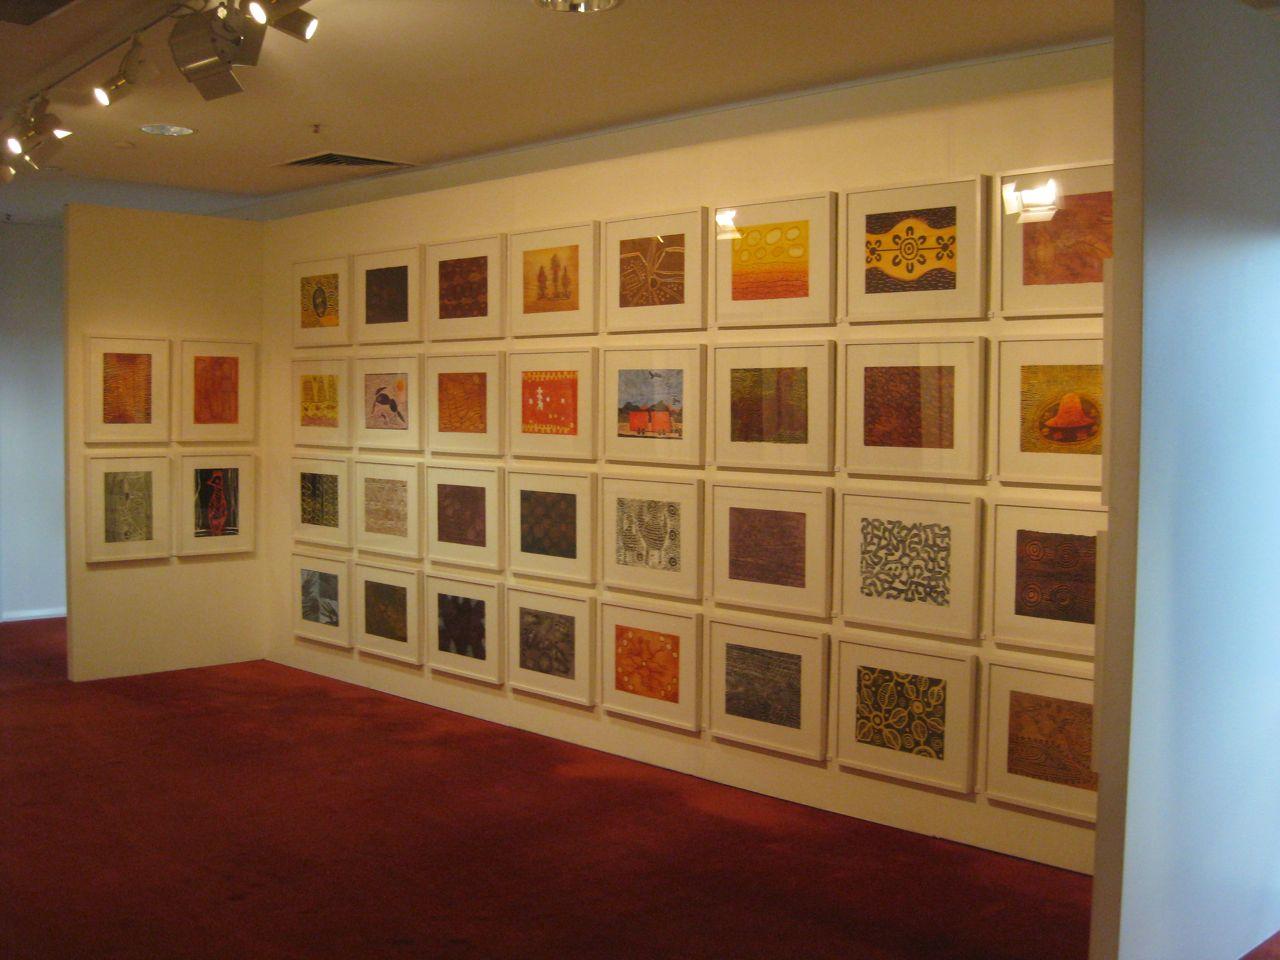 Desert Mob Folio Box, 40 woodcuts. Edition 7/10 $6,600 (unframed in presentation box)